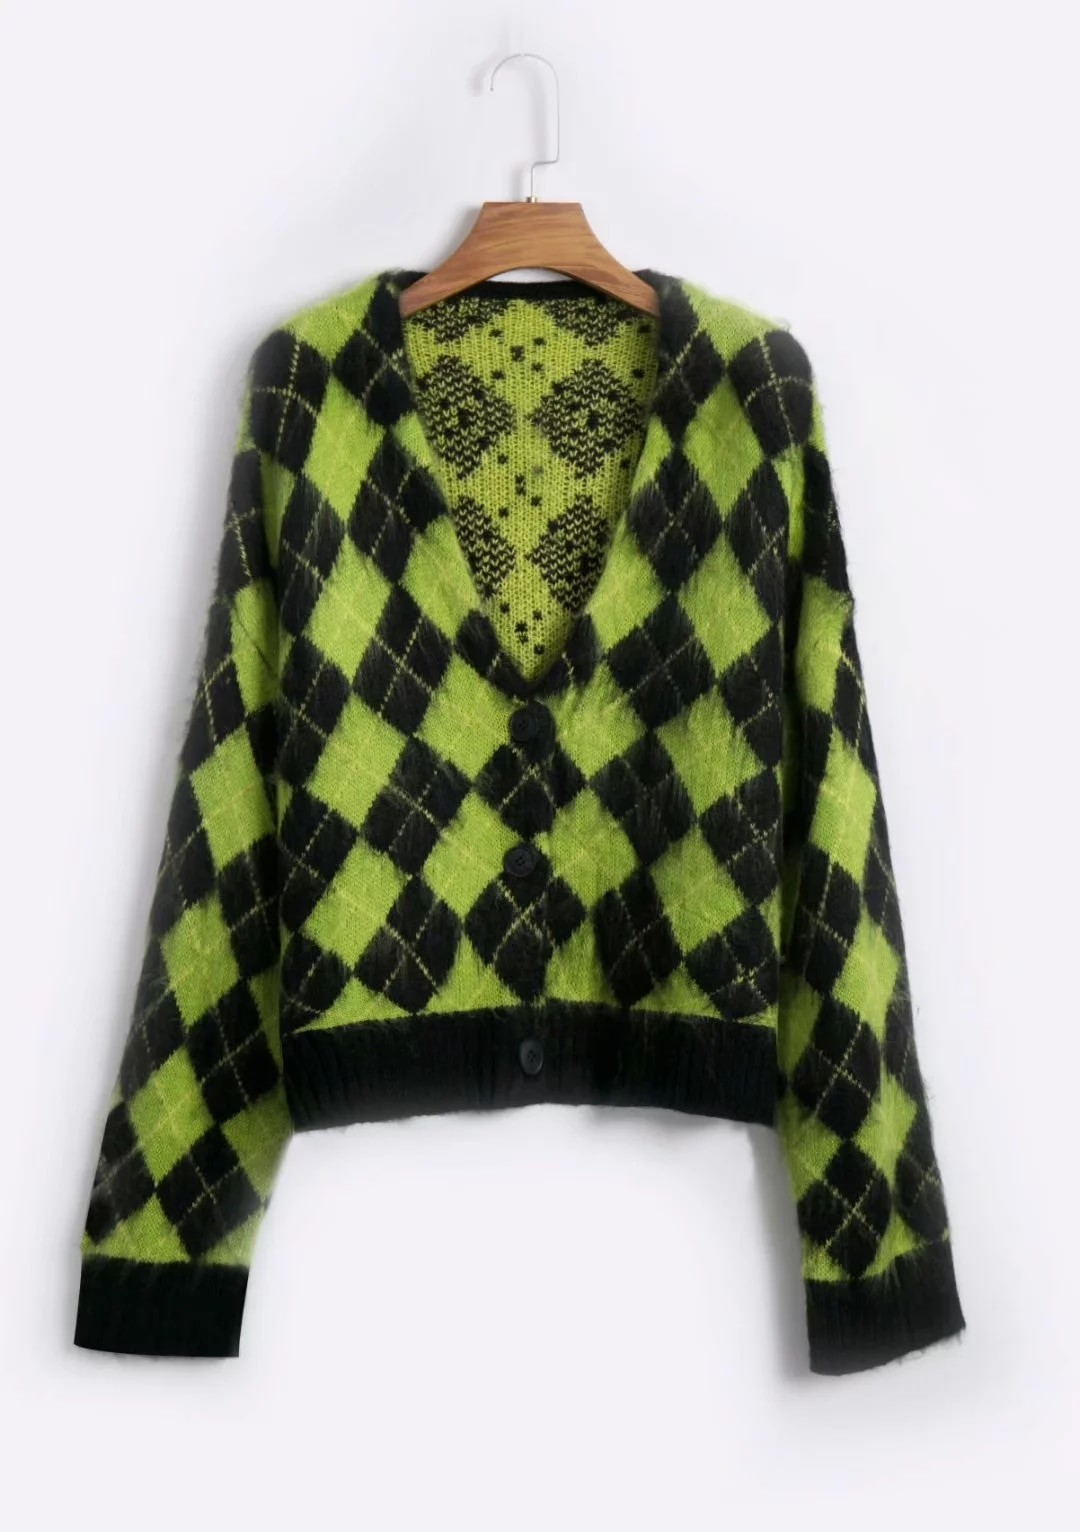 Punk Vintage knitted oversized cardigan 41